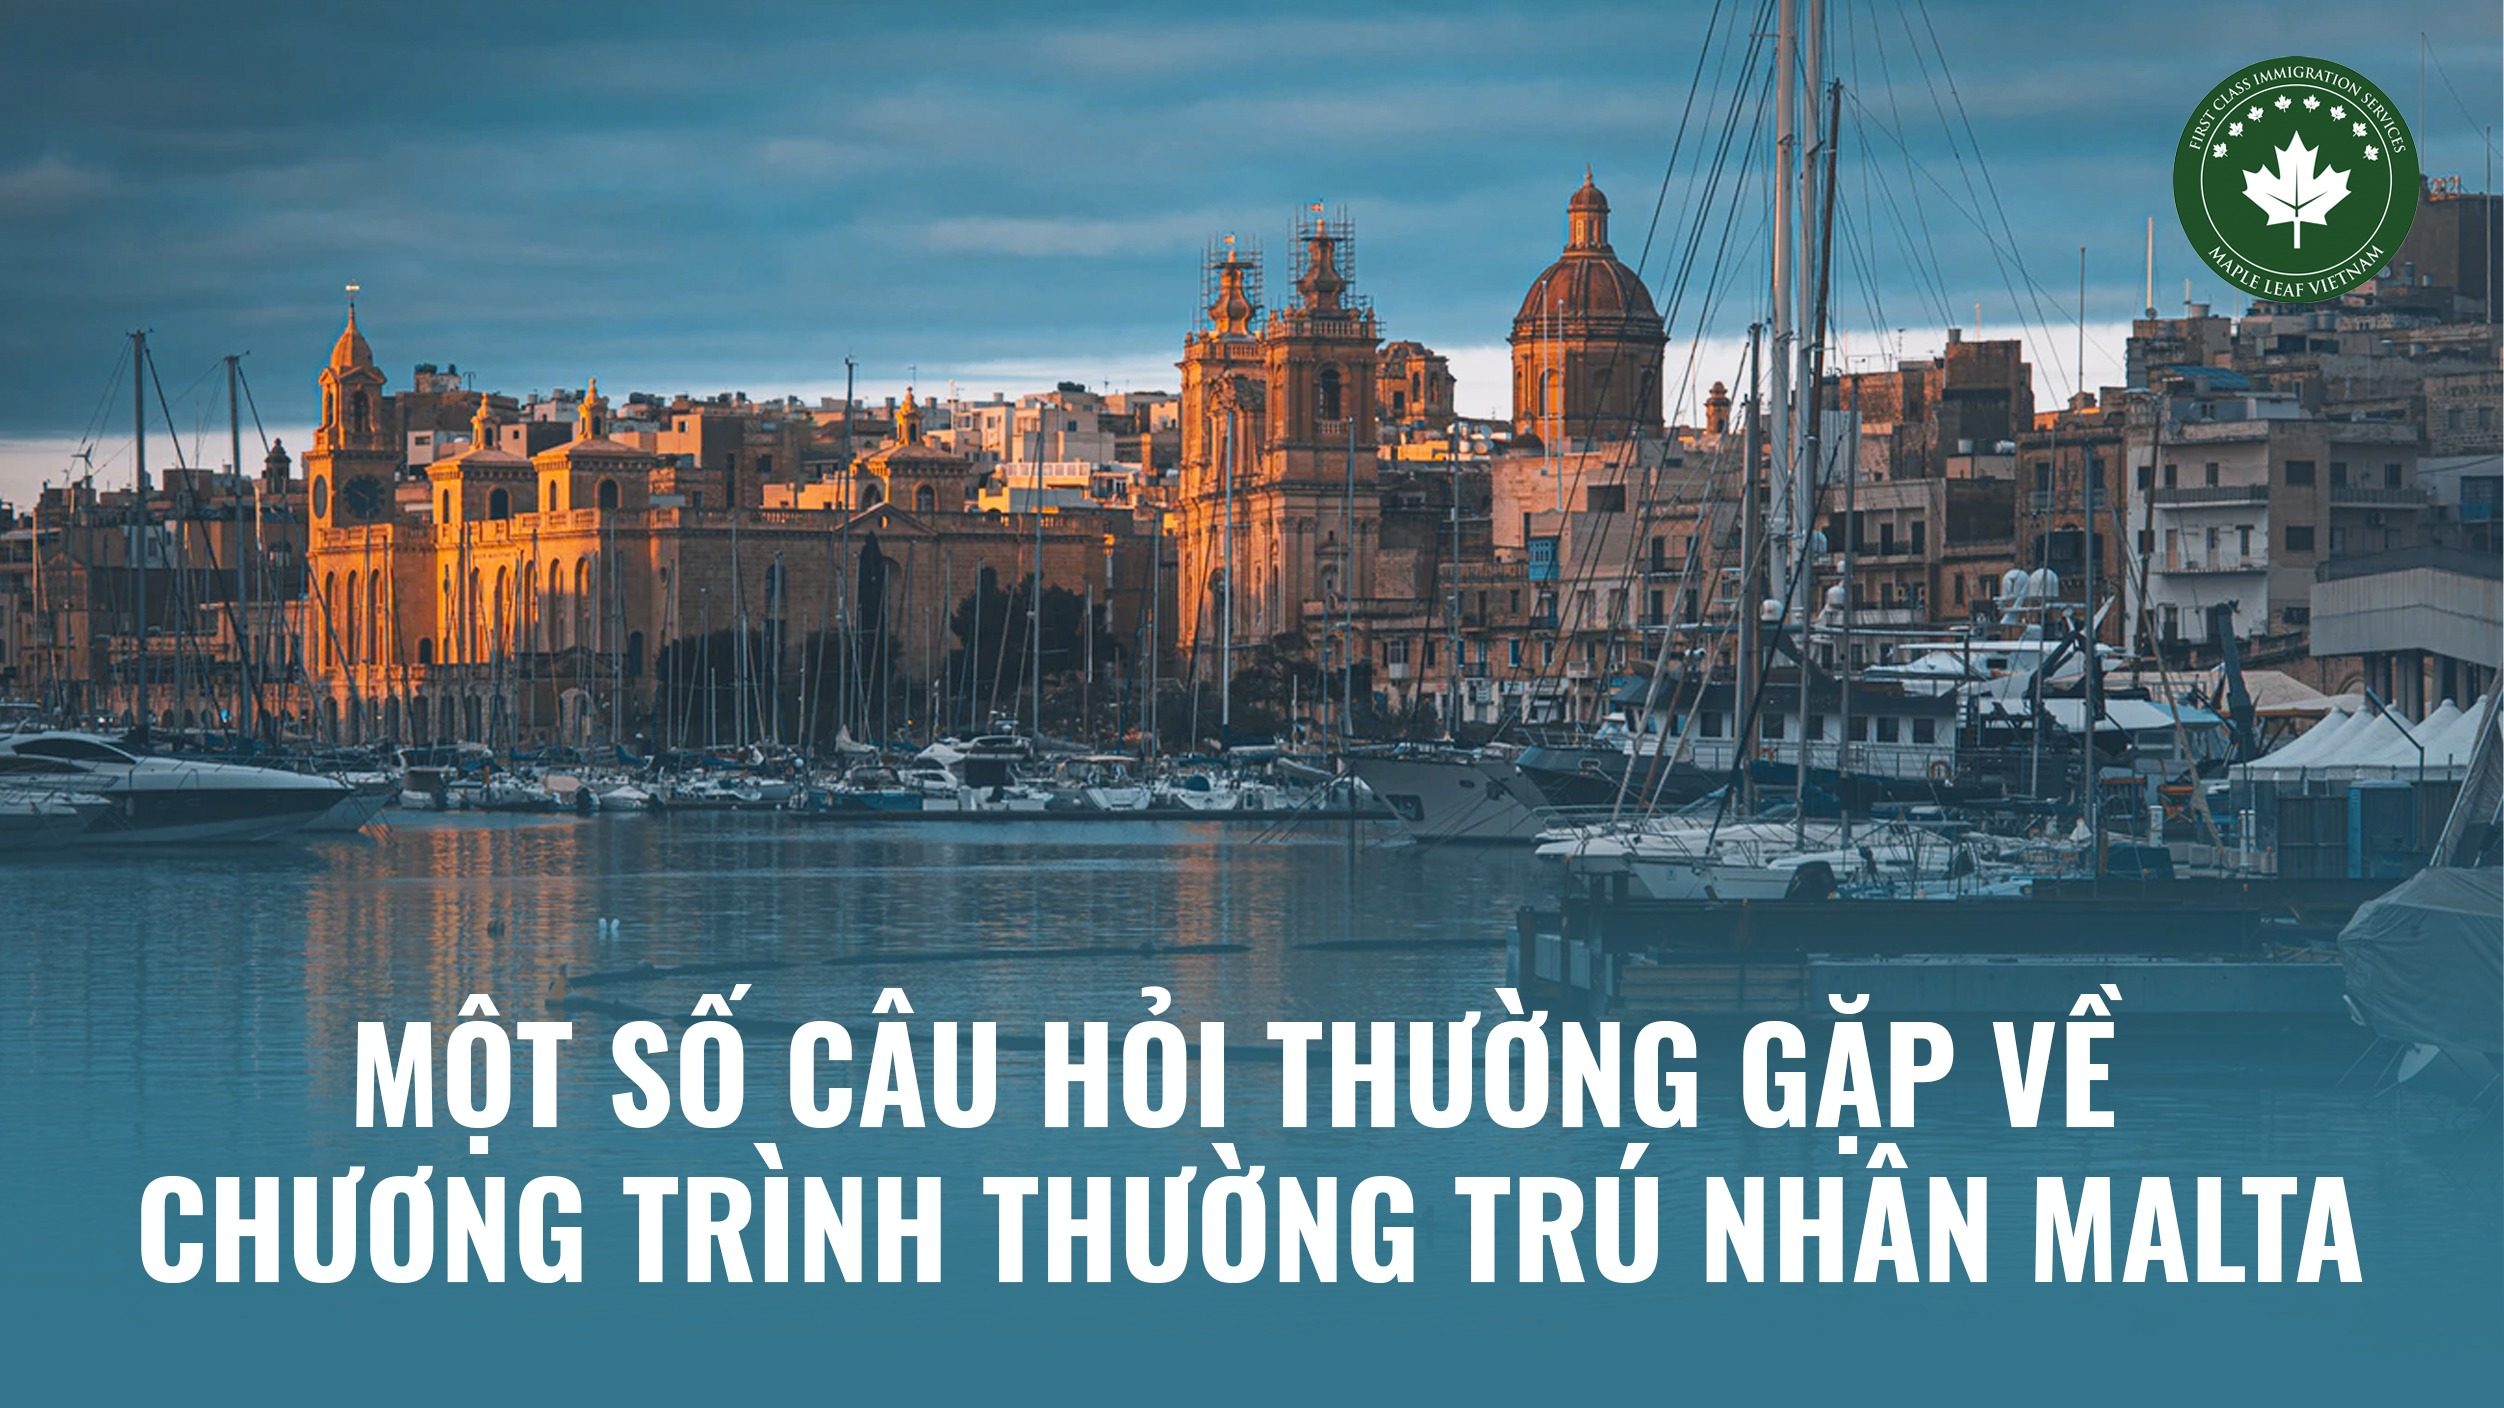 mot-so-cau-hoi-thuong-gap-ve-chuong-trinh-thuong-tru-nhan-malta